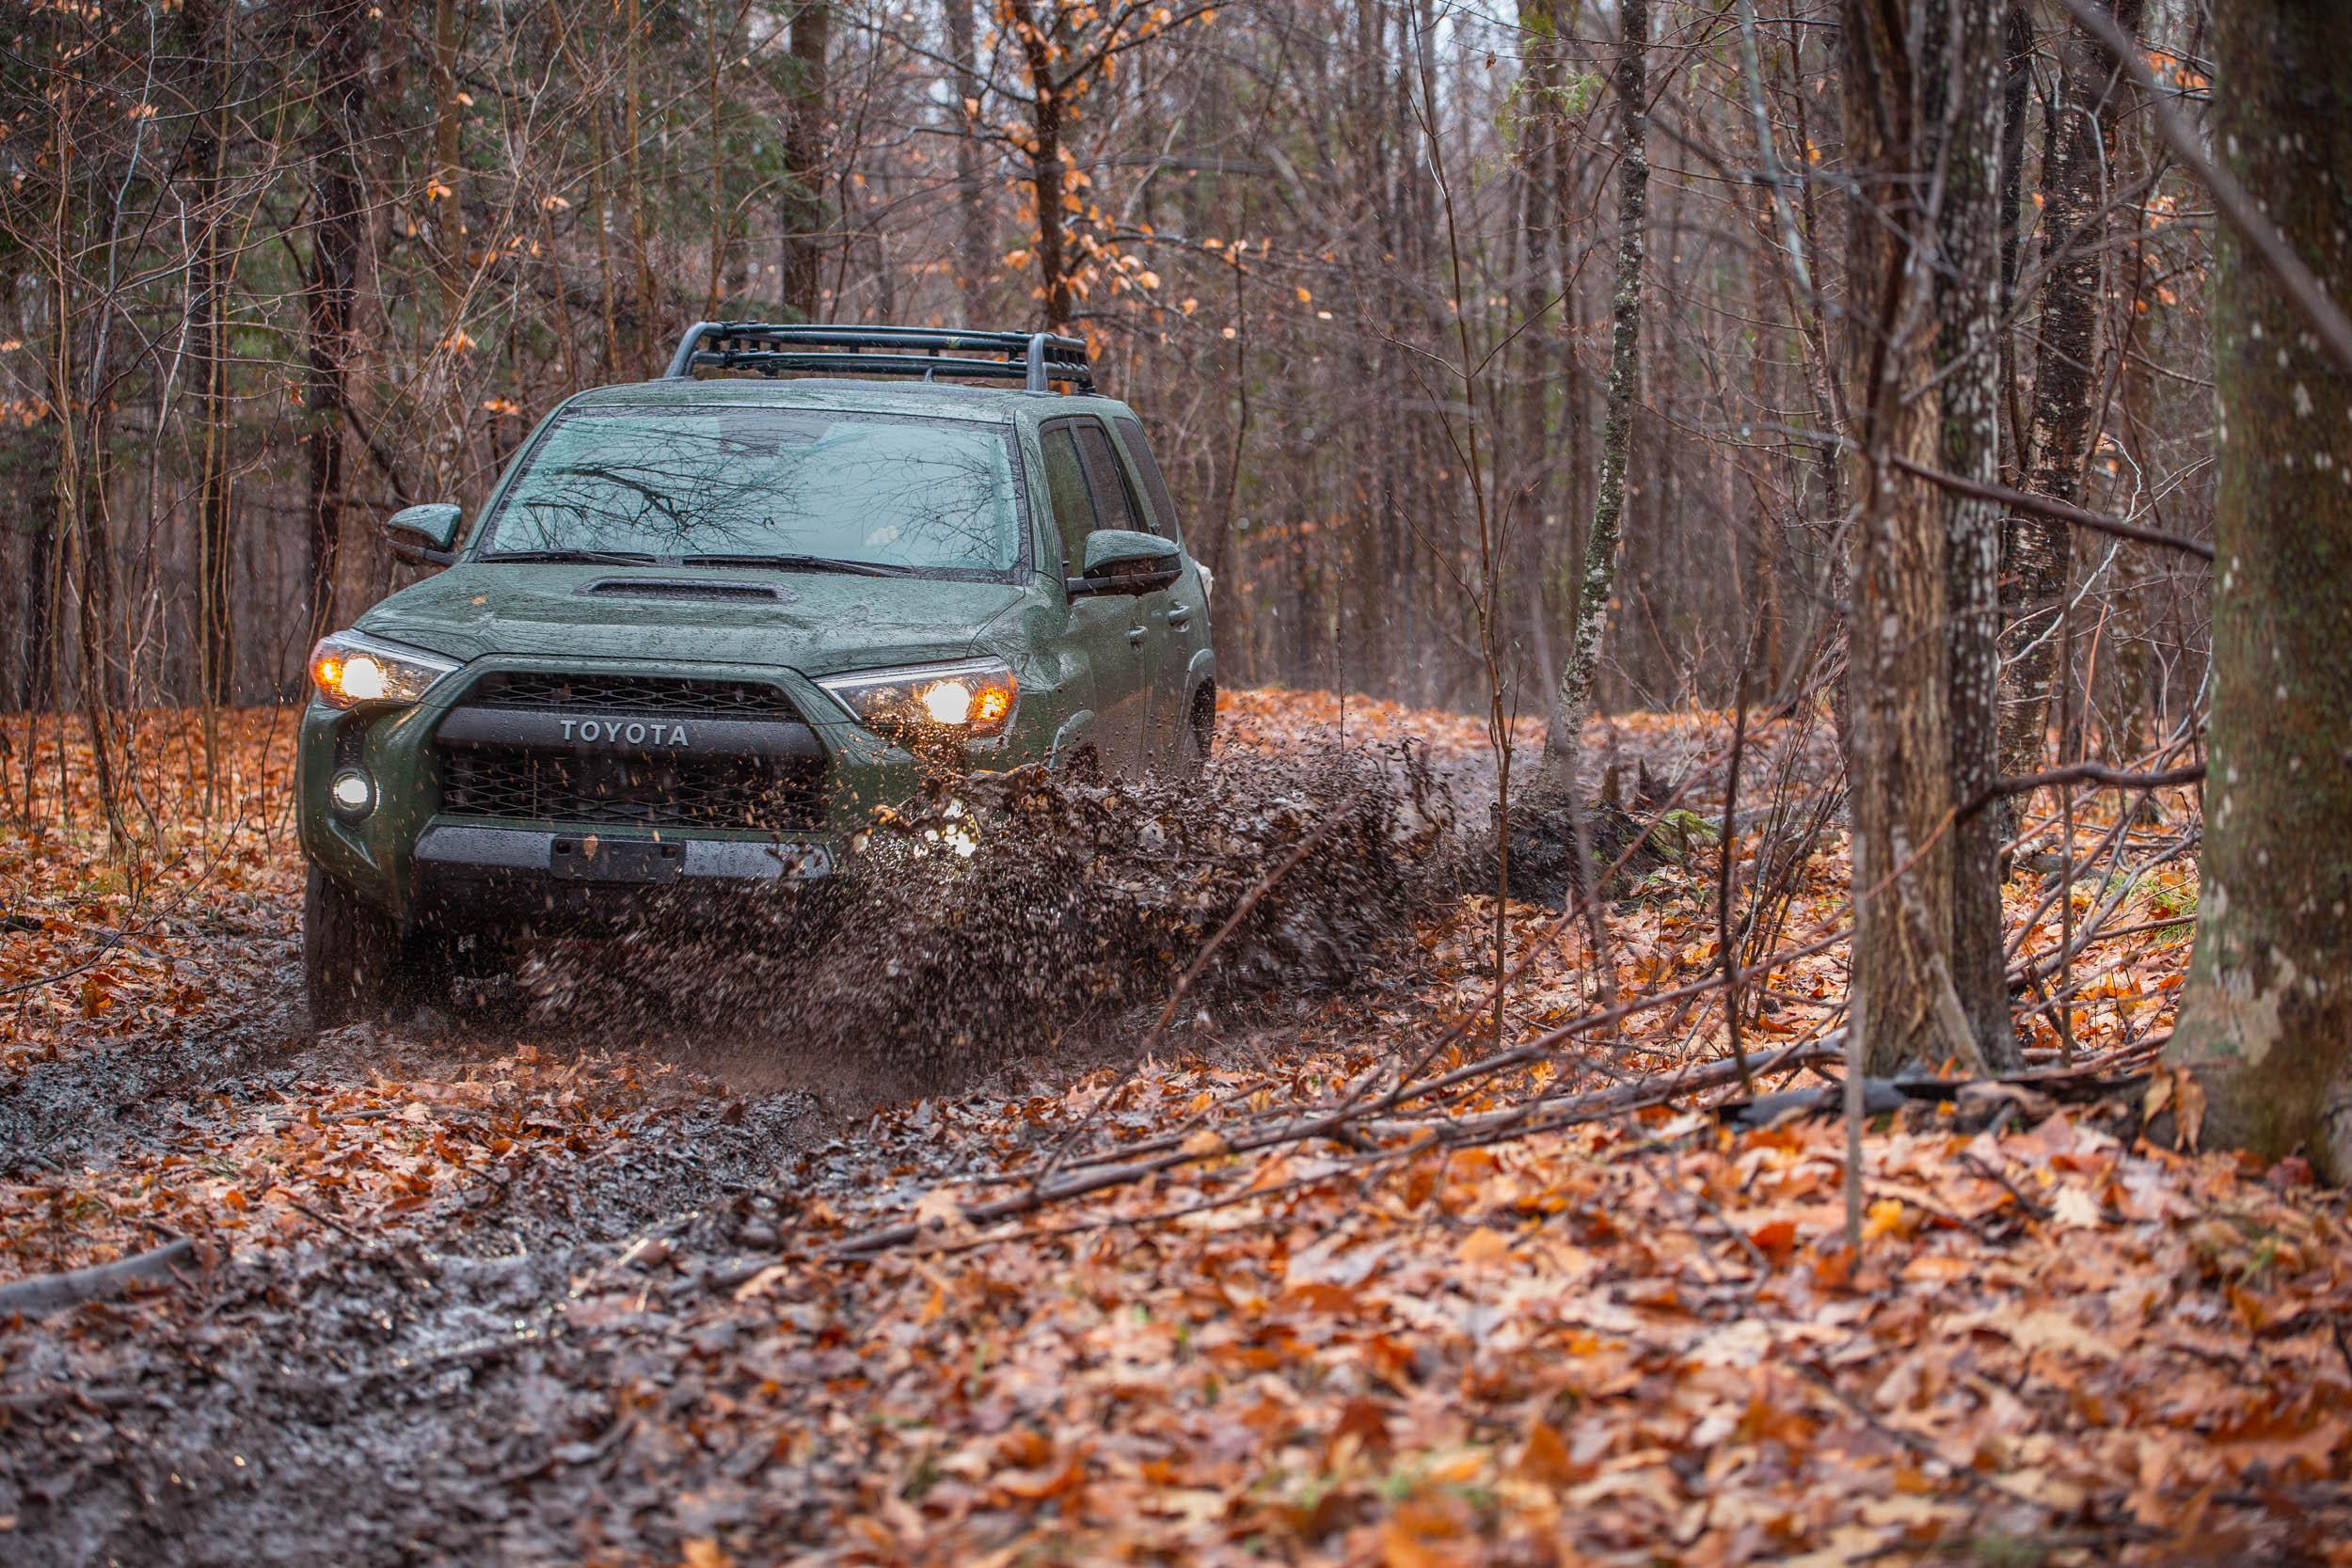 Splashing in the Mud